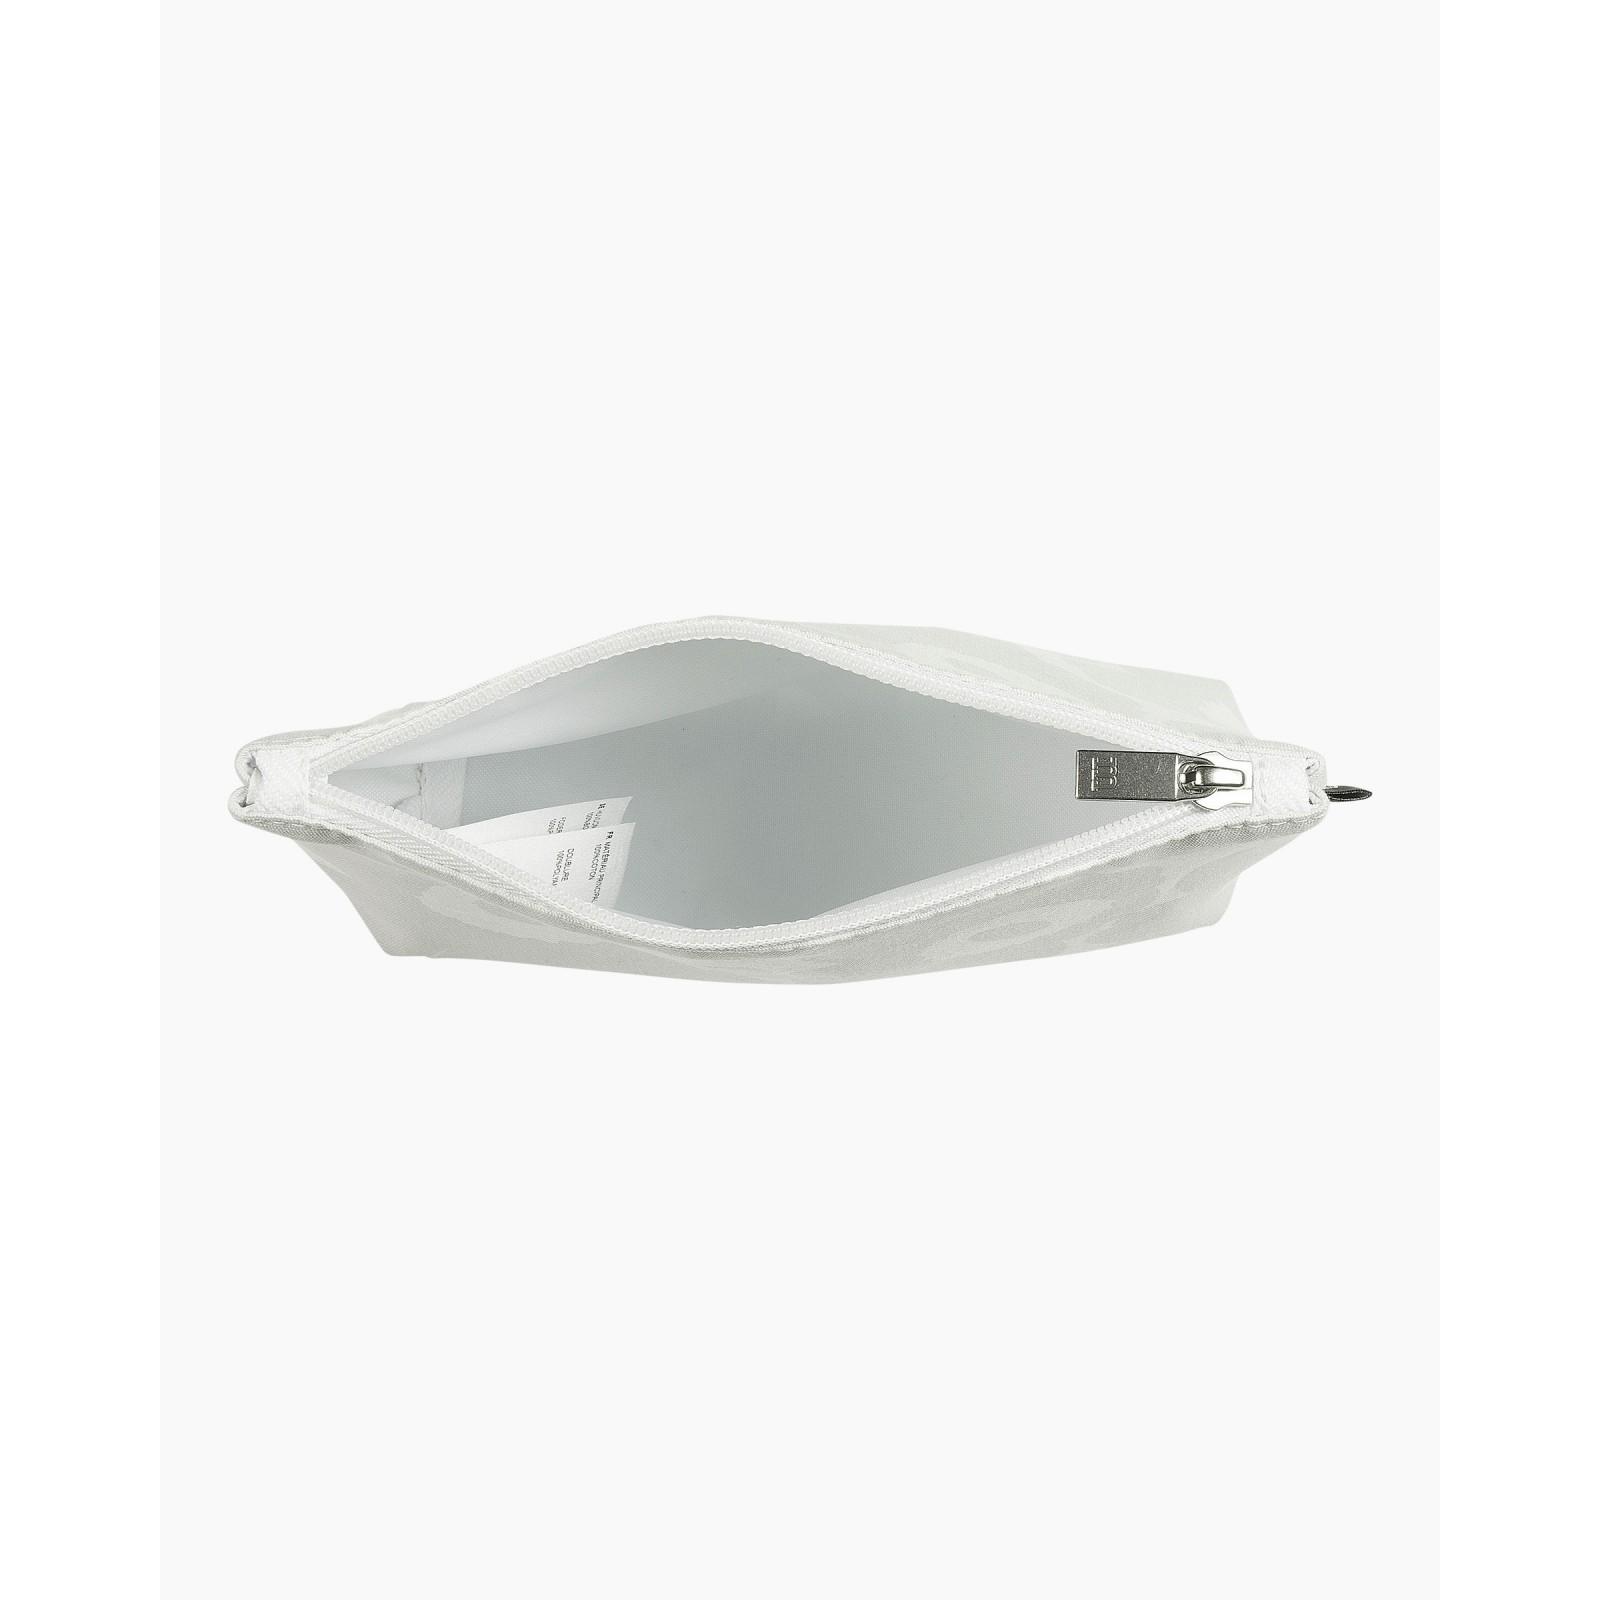 Eelia Mini Unikko cosmetic bag white/ light grey